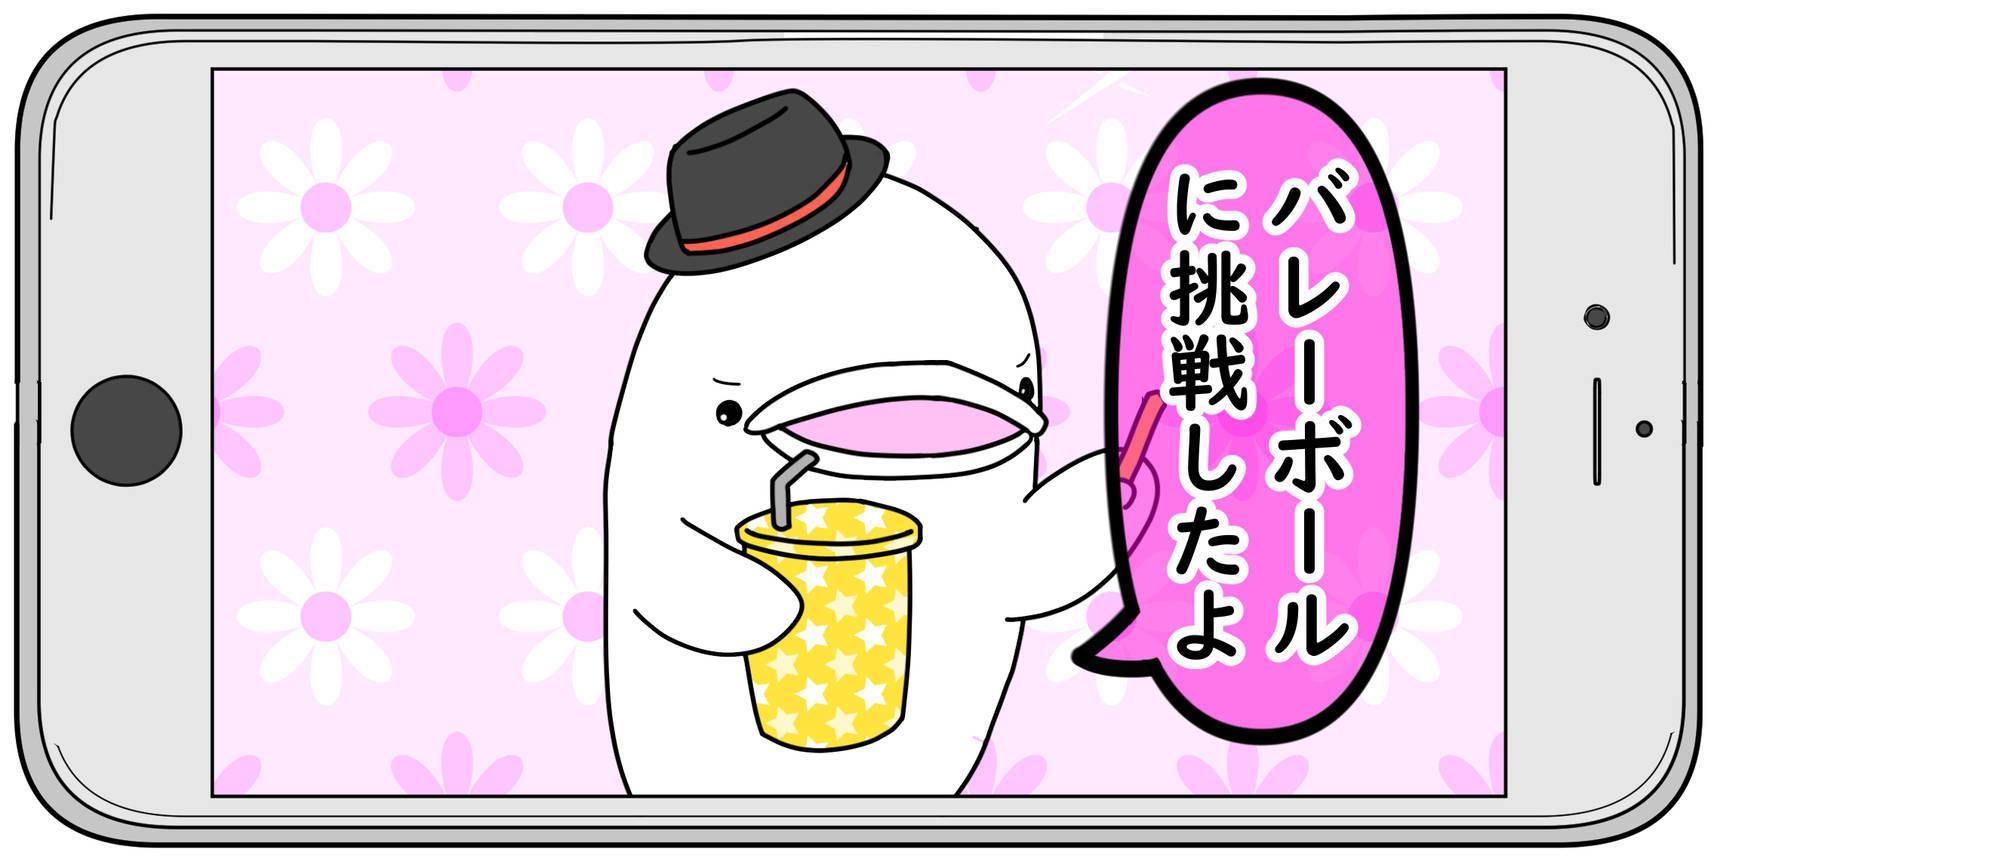 f:id:shiro_iruka:20190517000417j:plain